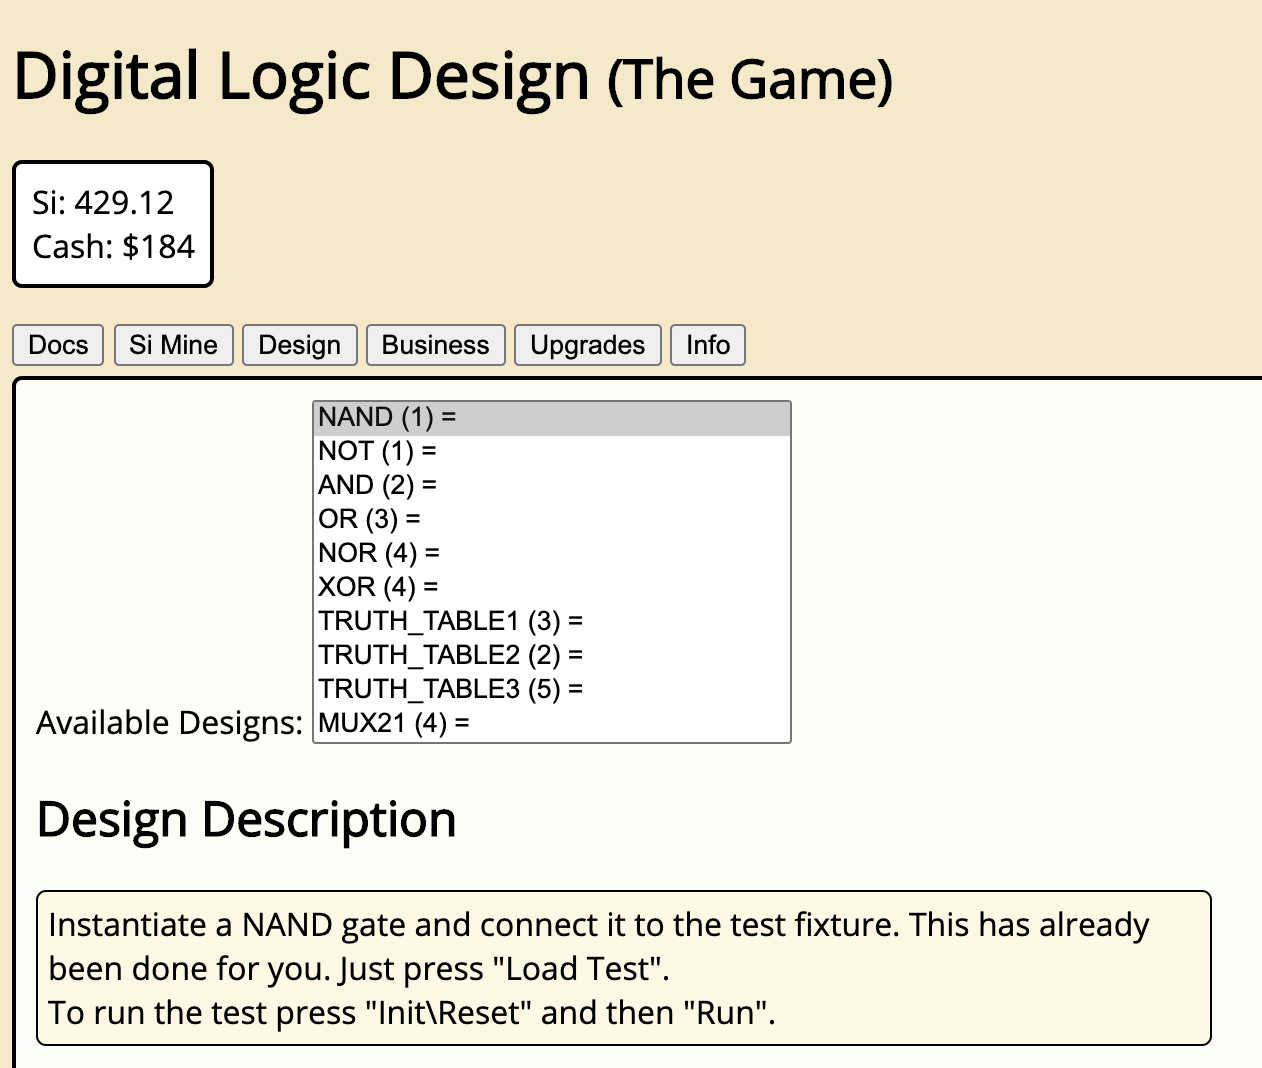 Digital Logic Design (The Game)